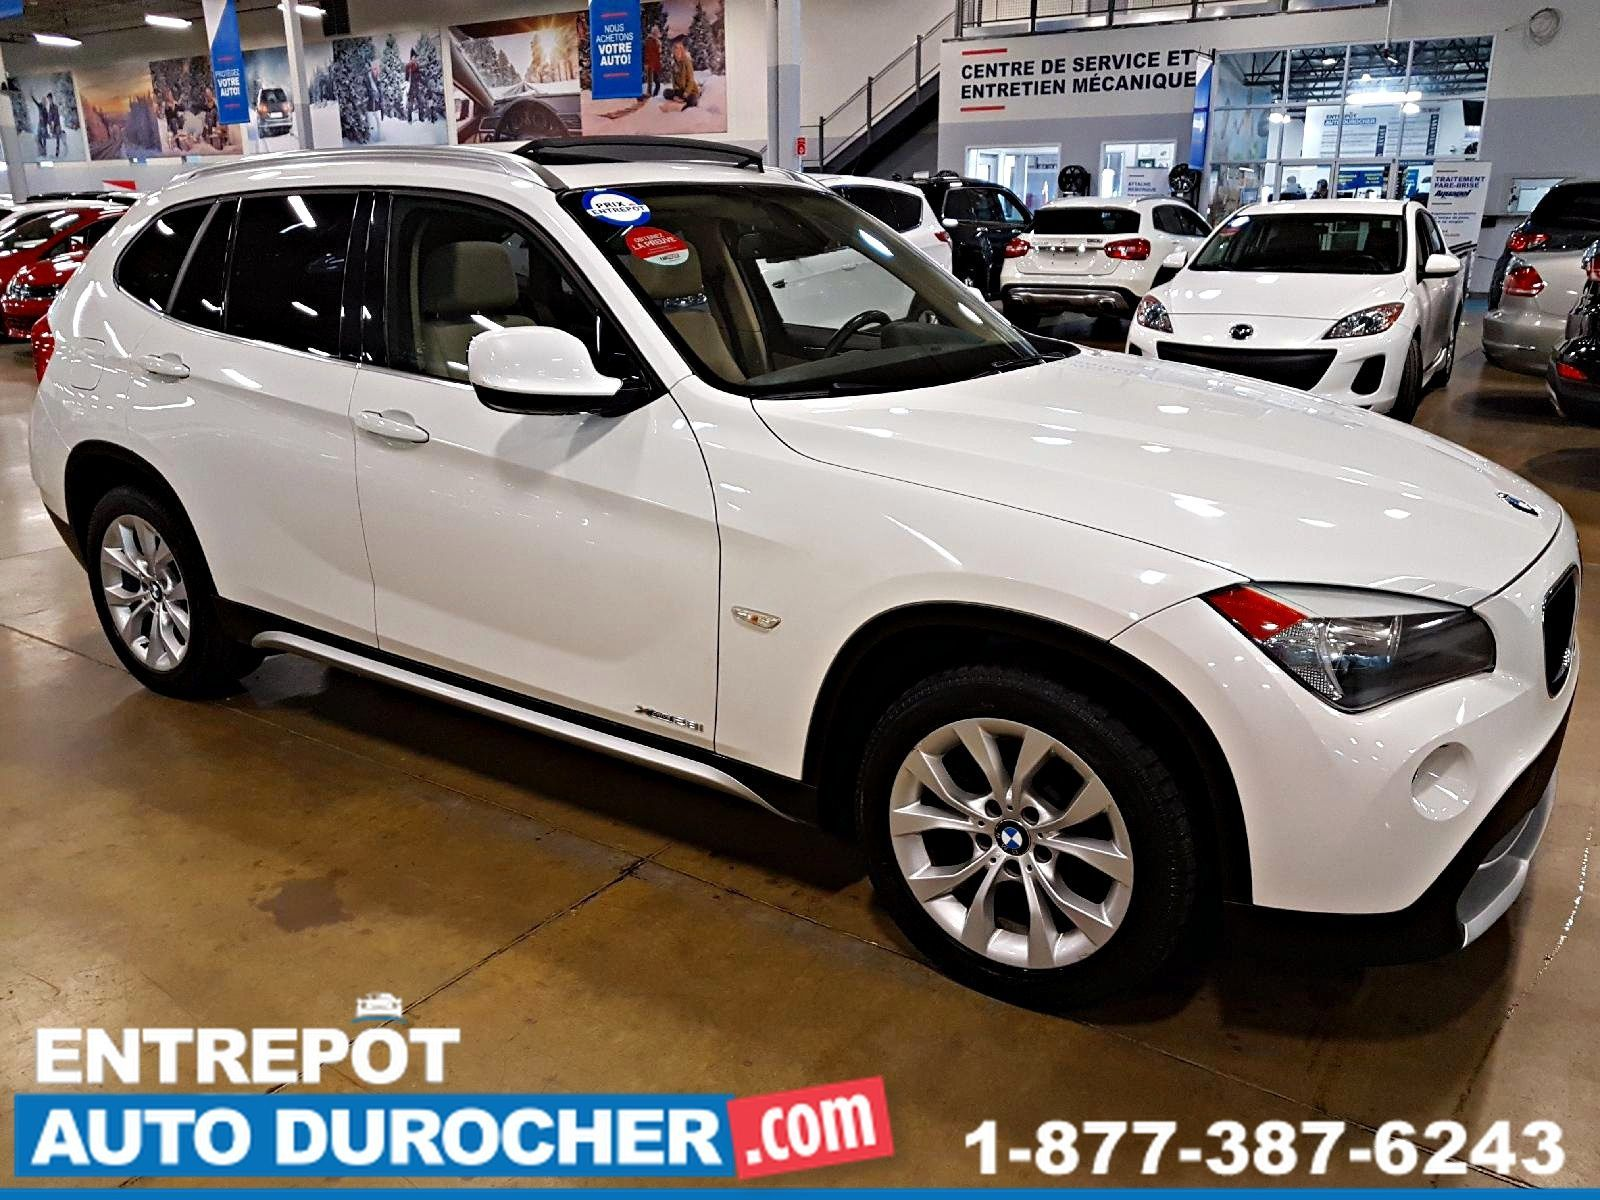 BMW X1 28i AWD AUTOMATIQUE, TOIT OUVRANT, CUIR 2012